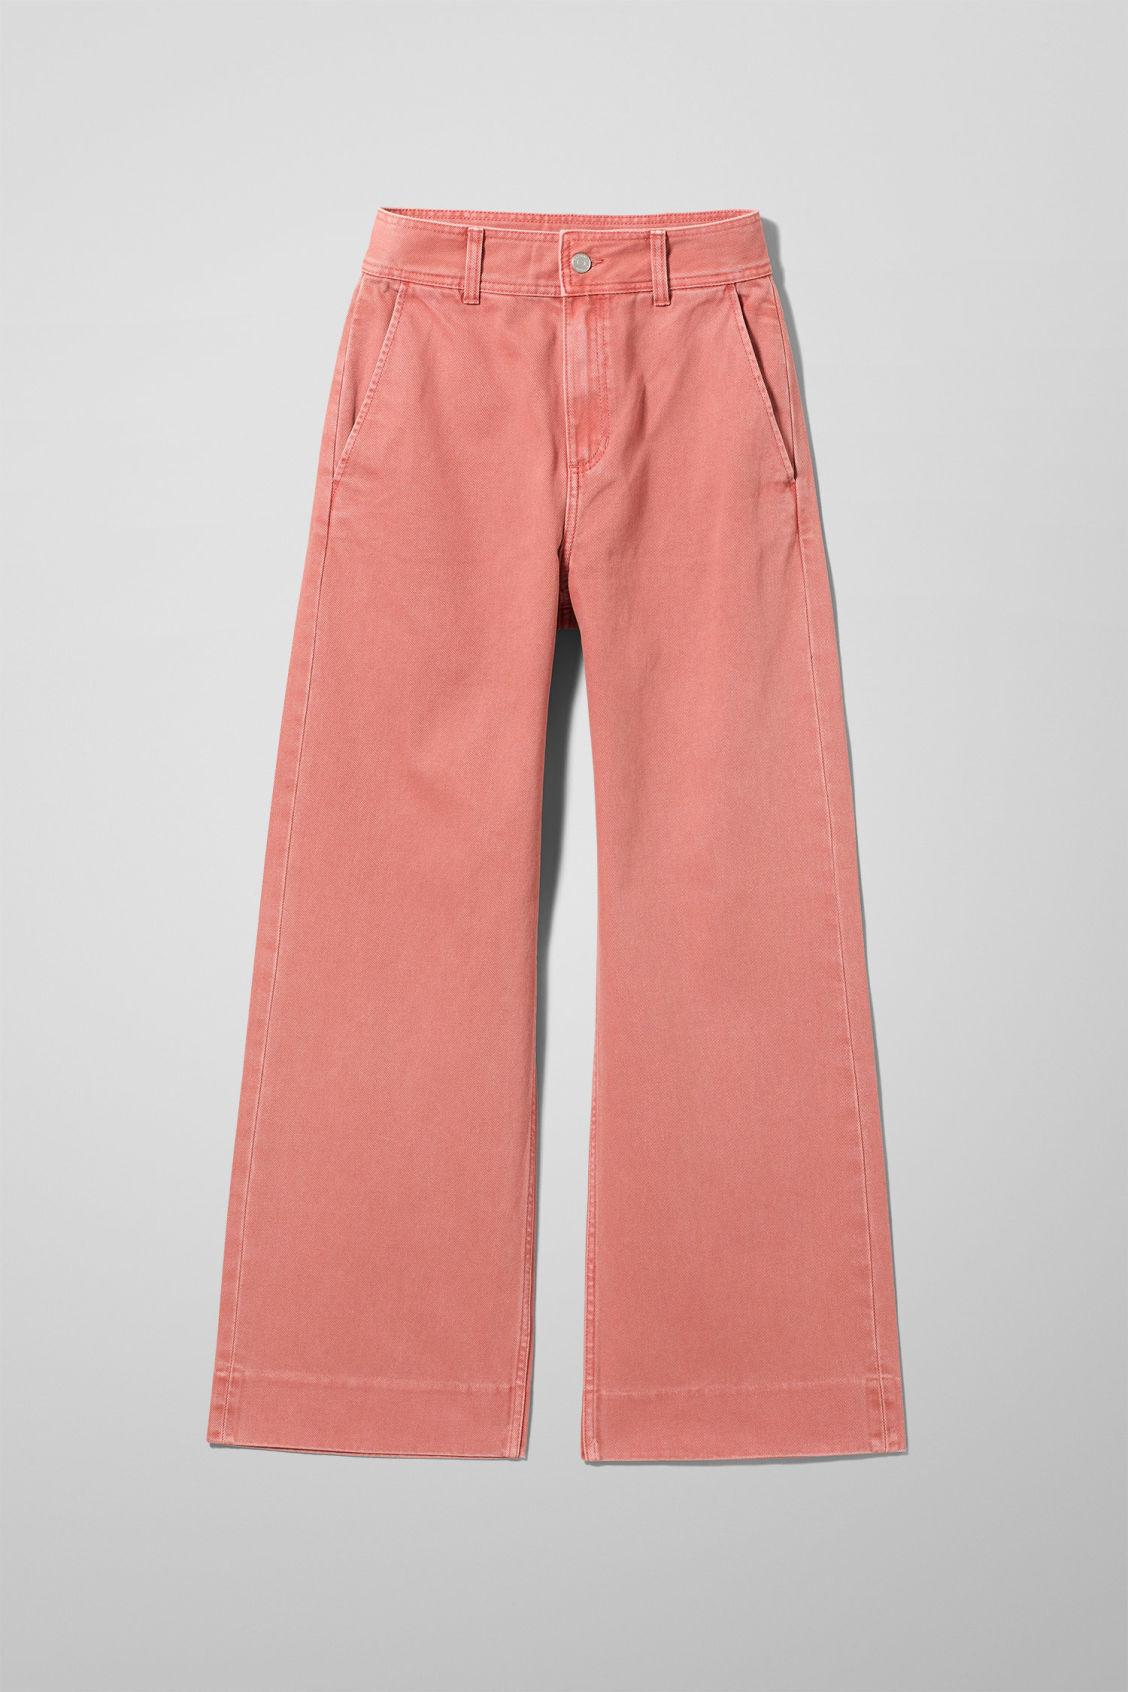 Cory Rose Denim Trousers - Orange-42